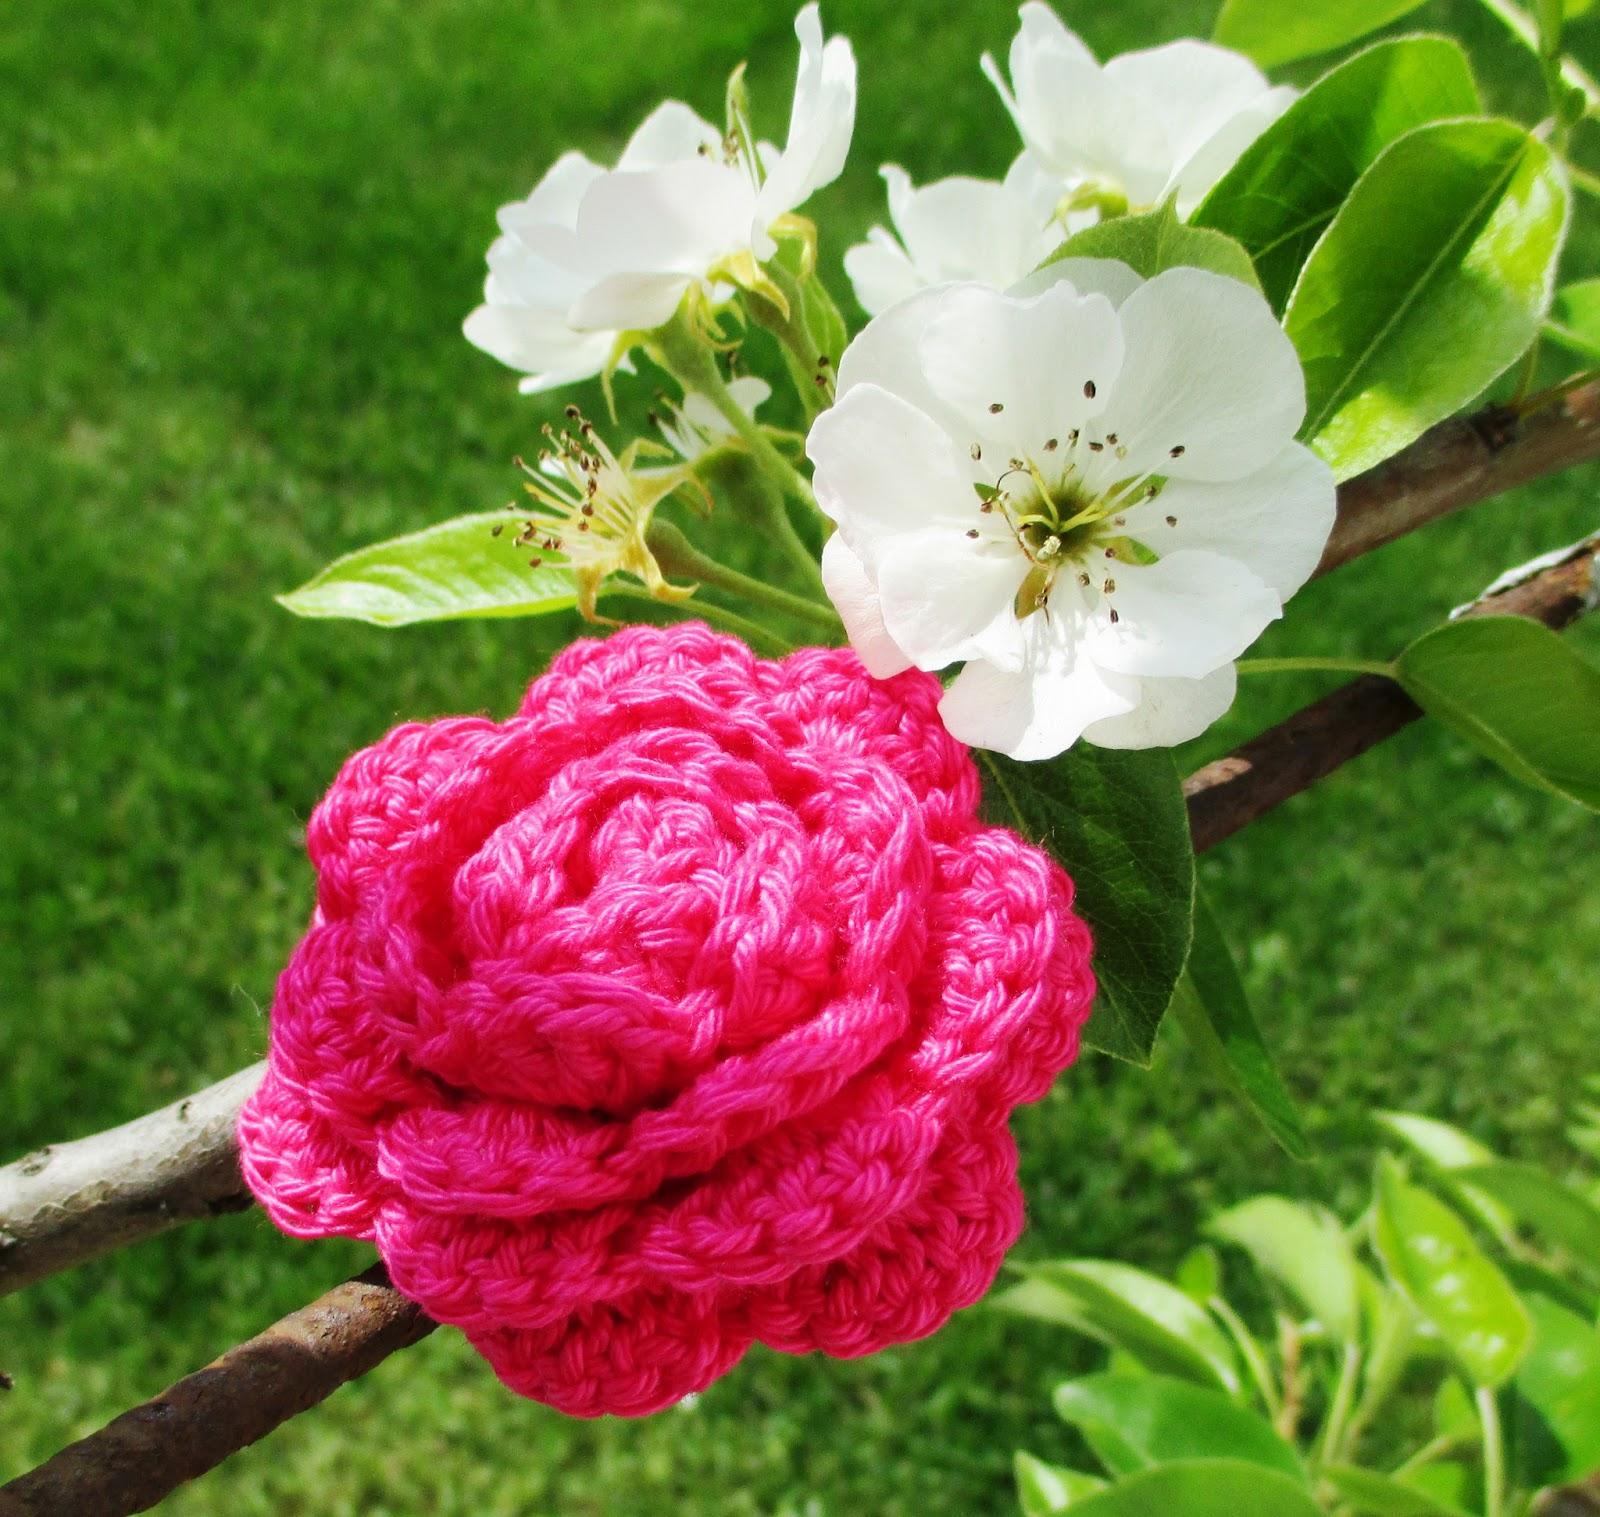 denisandra kunterbunt willst du rose kaufen. Black Bedroom Furniture Sets. Home Design Ideas